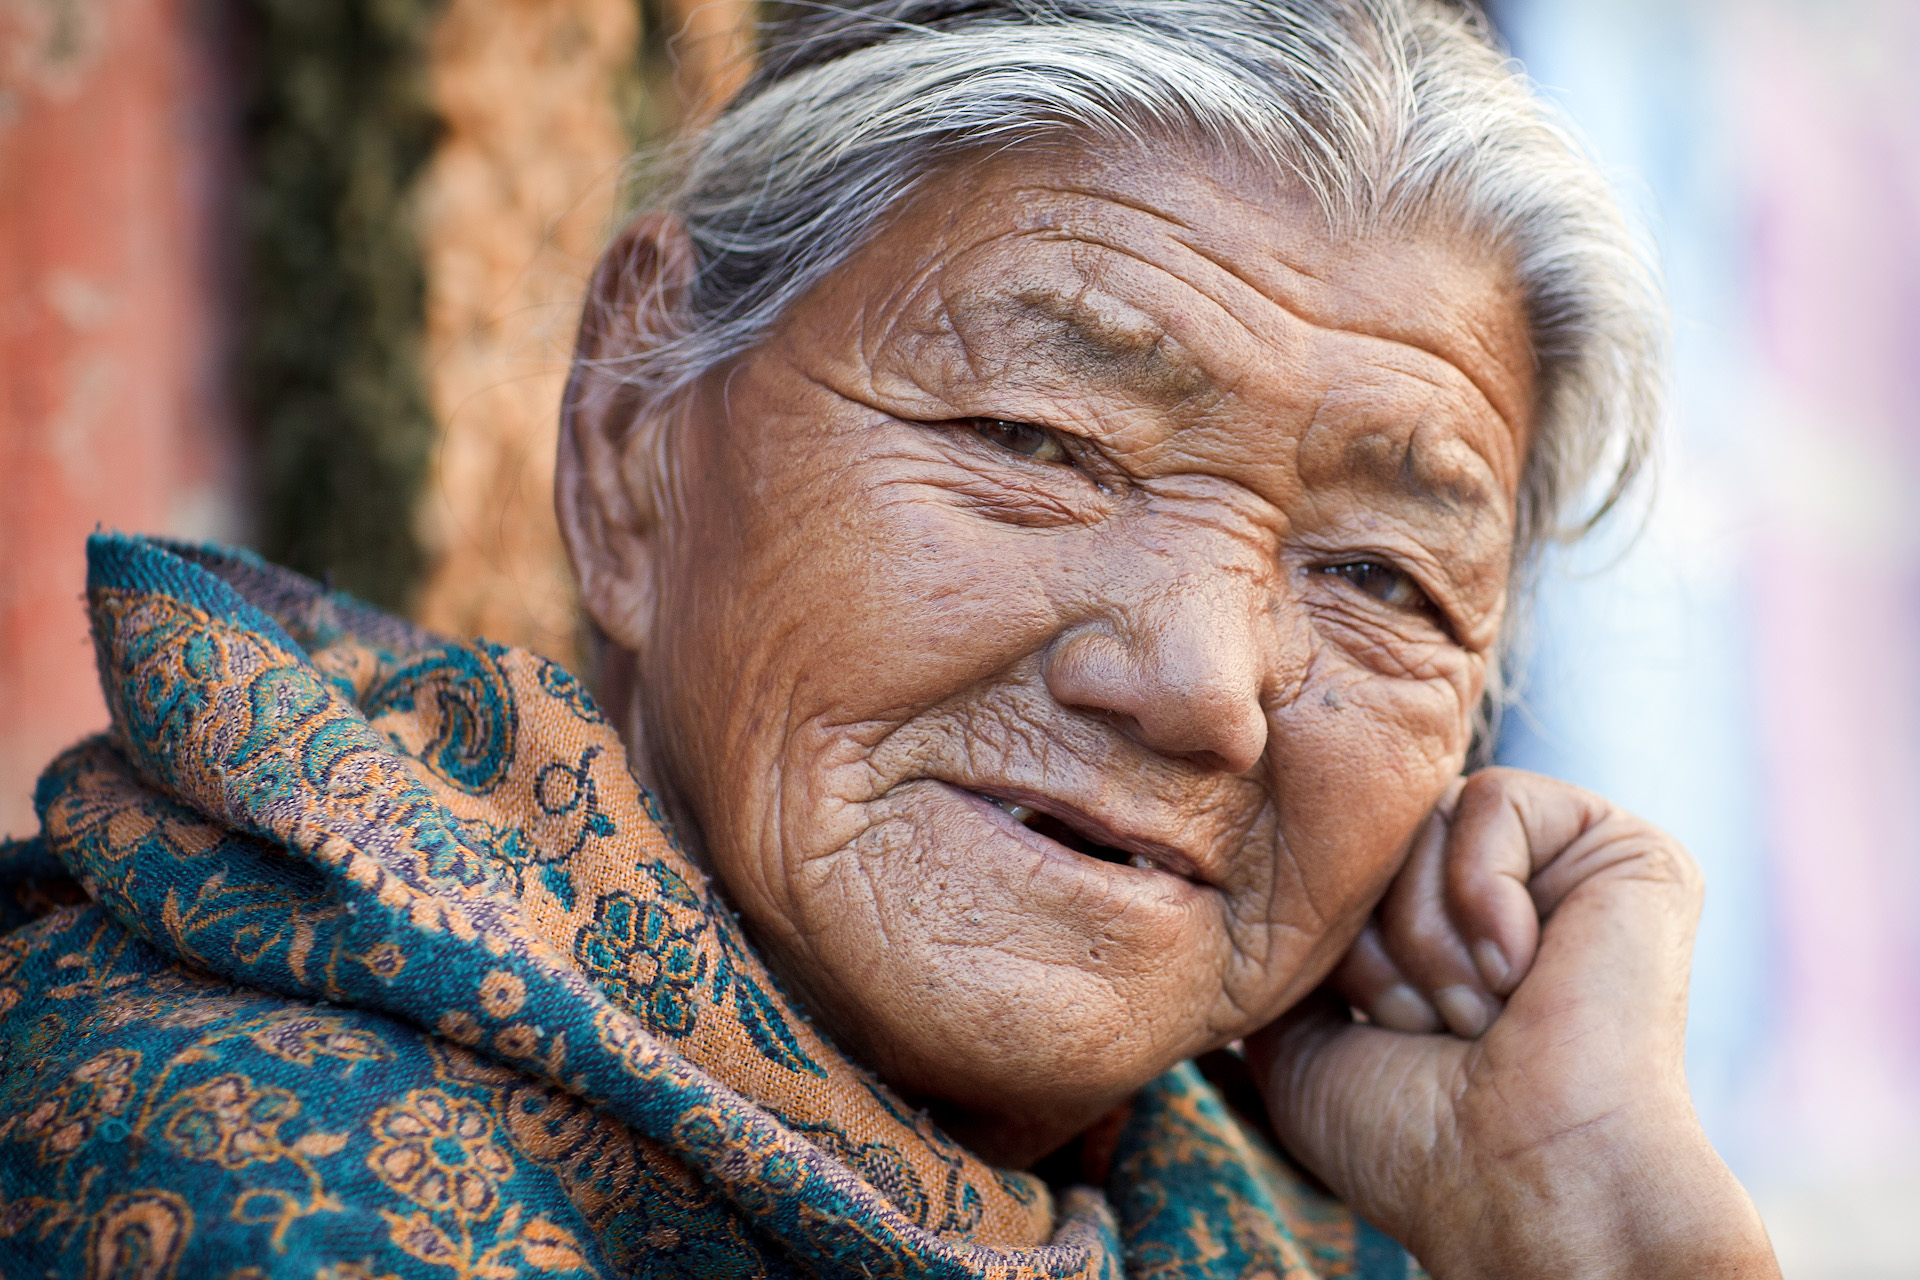 India-Darjeeling-Sikkim-Travel-Portrait-2.JPG